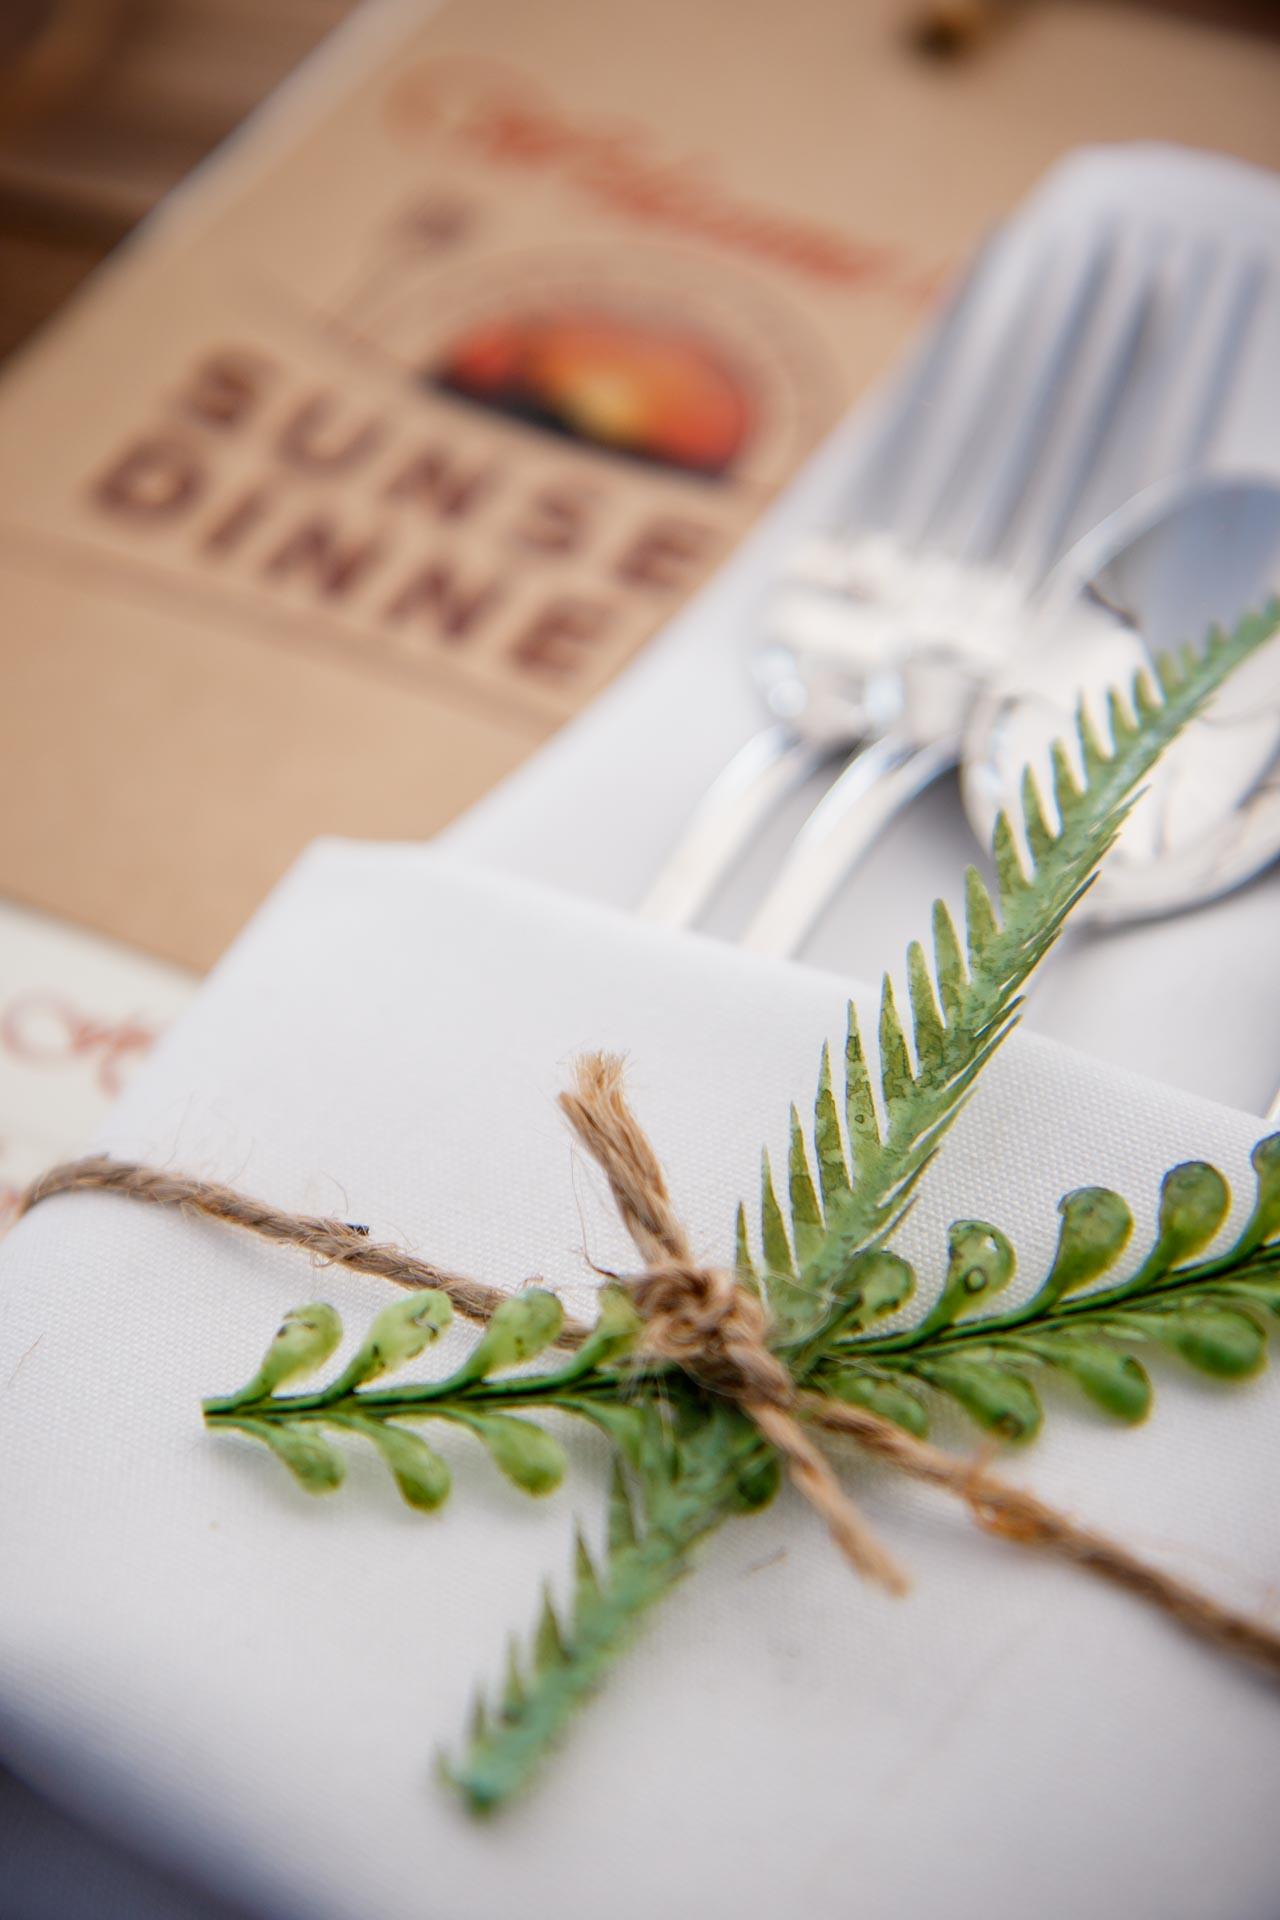 future-neenah-sunset-dinner-farm-to-table-adam-shea-photography-green-bay-appleton-neenah-photographer-2.jpg